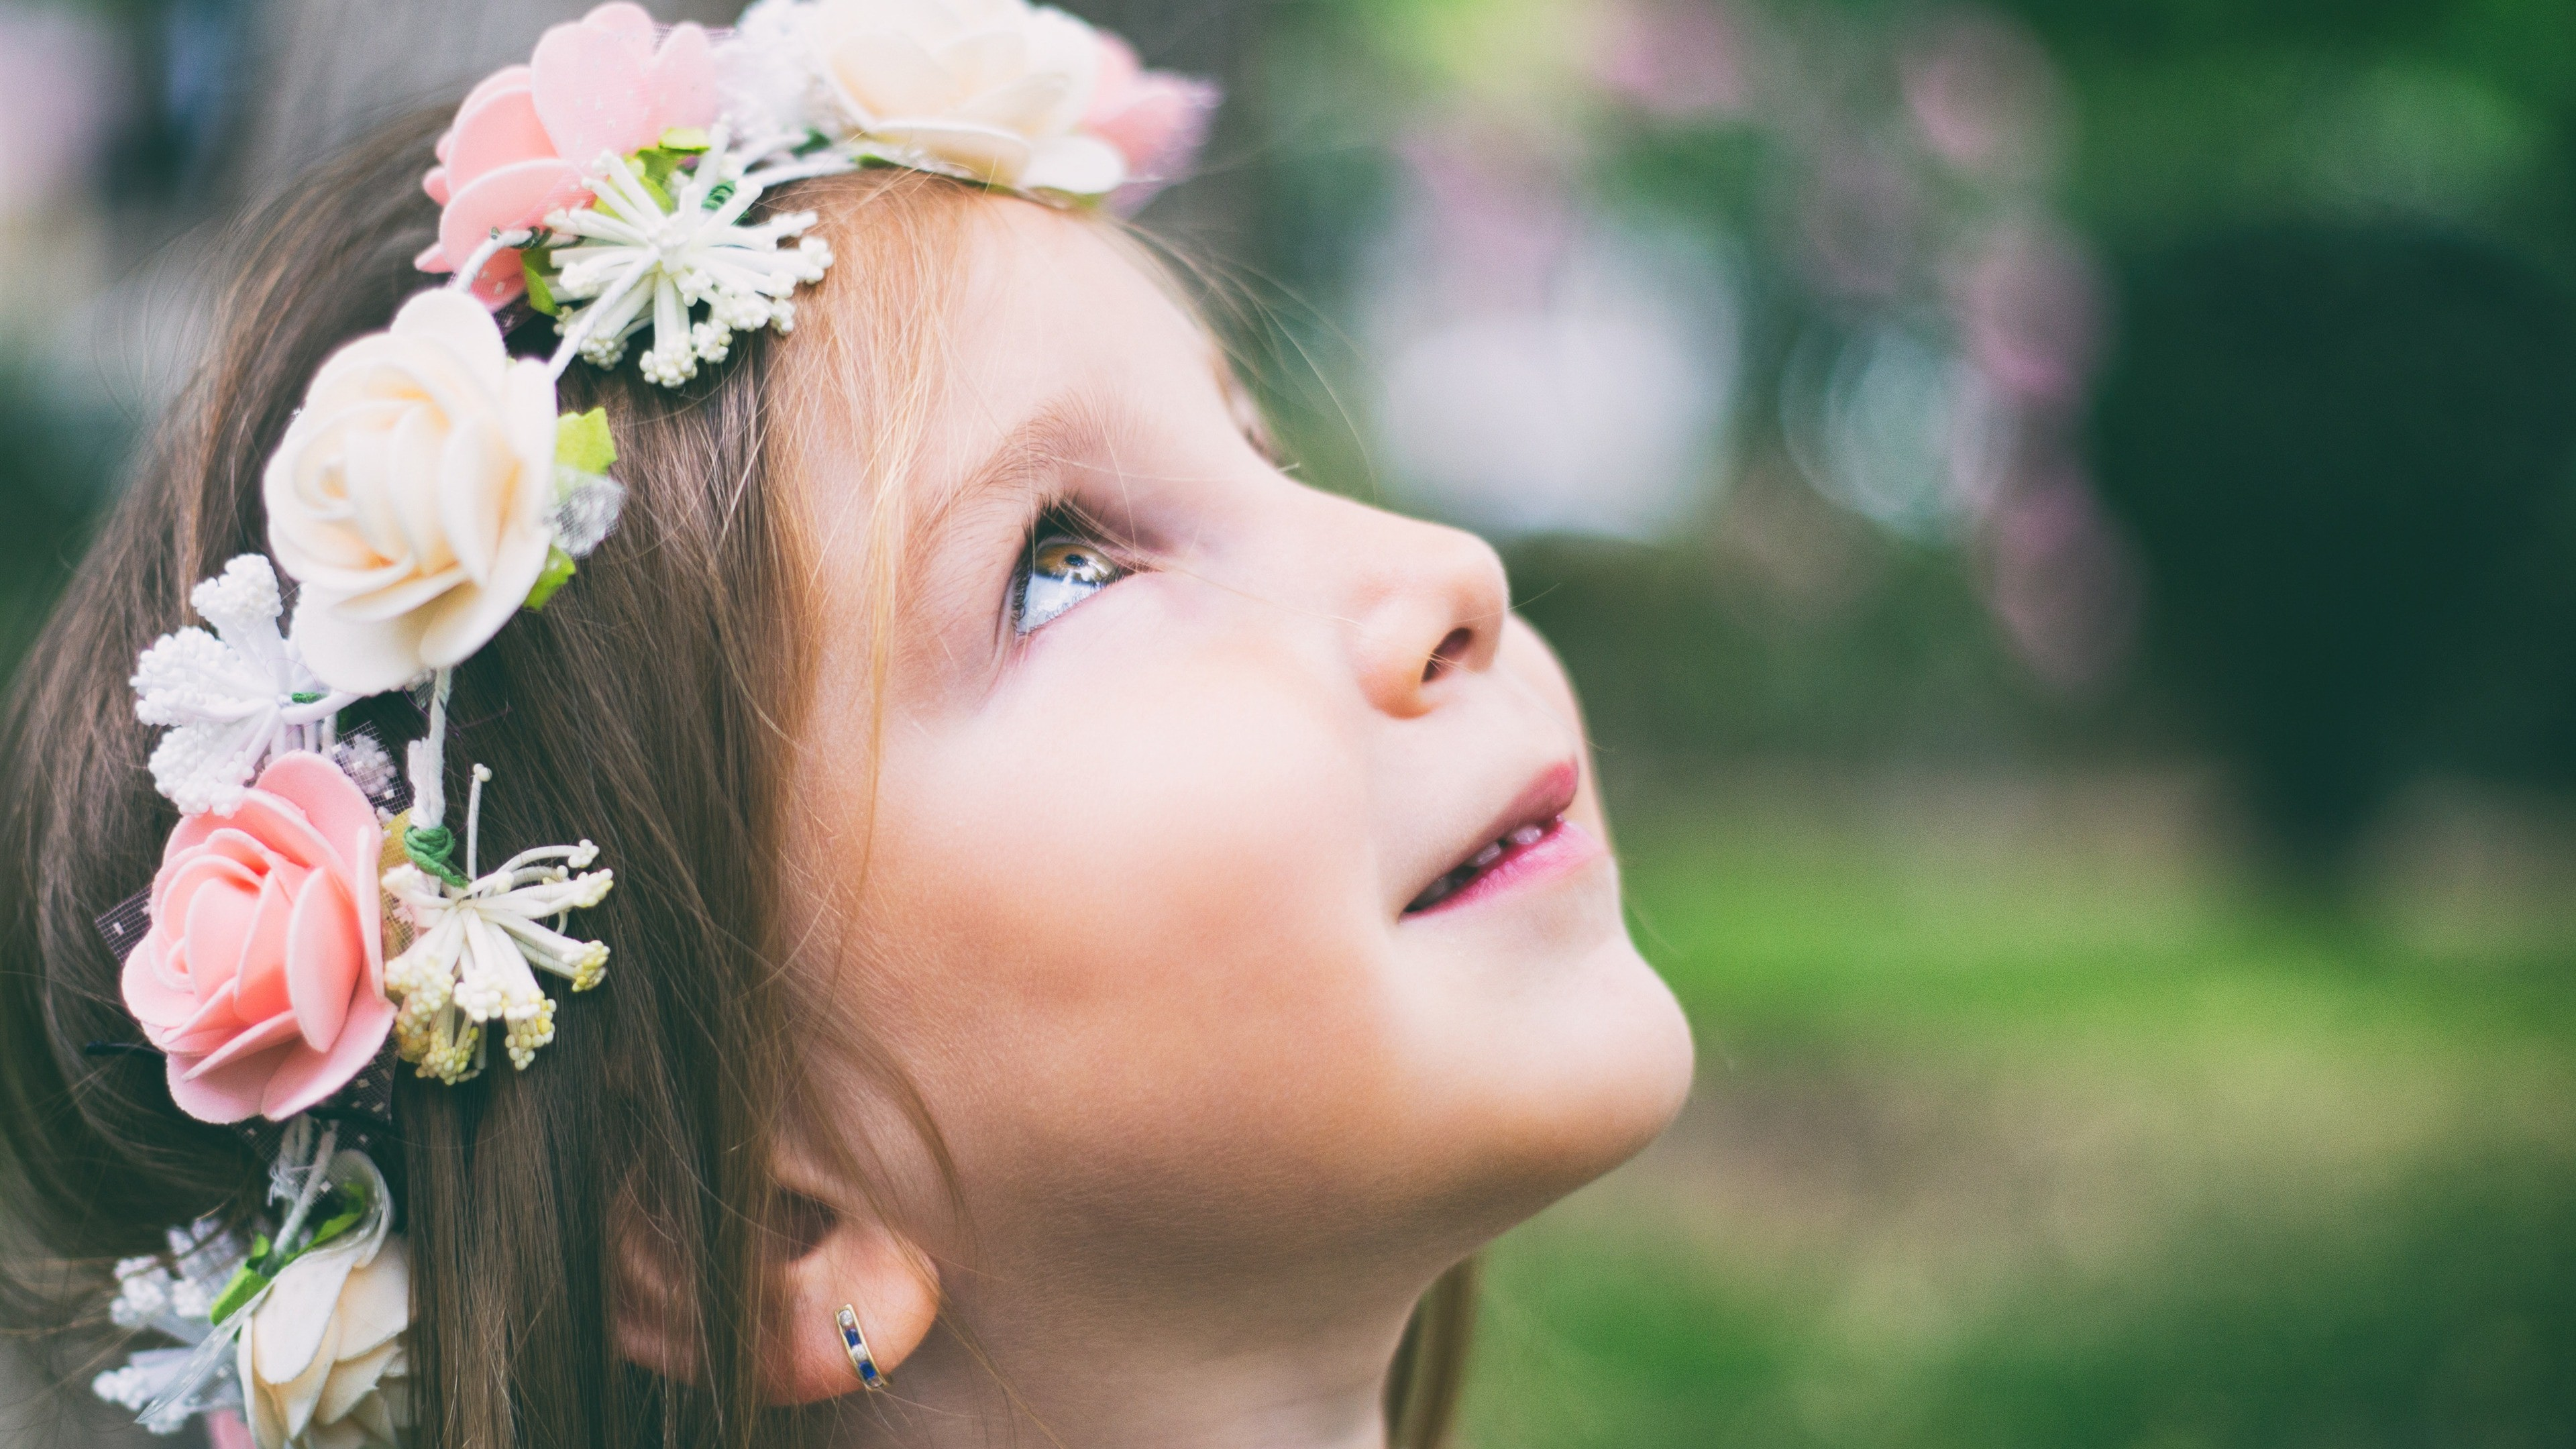 Graceful Baby Girl Wearing Flower Ring 4k Wallpaper - Baby Girl , HD Wallpaper & Backgrounds